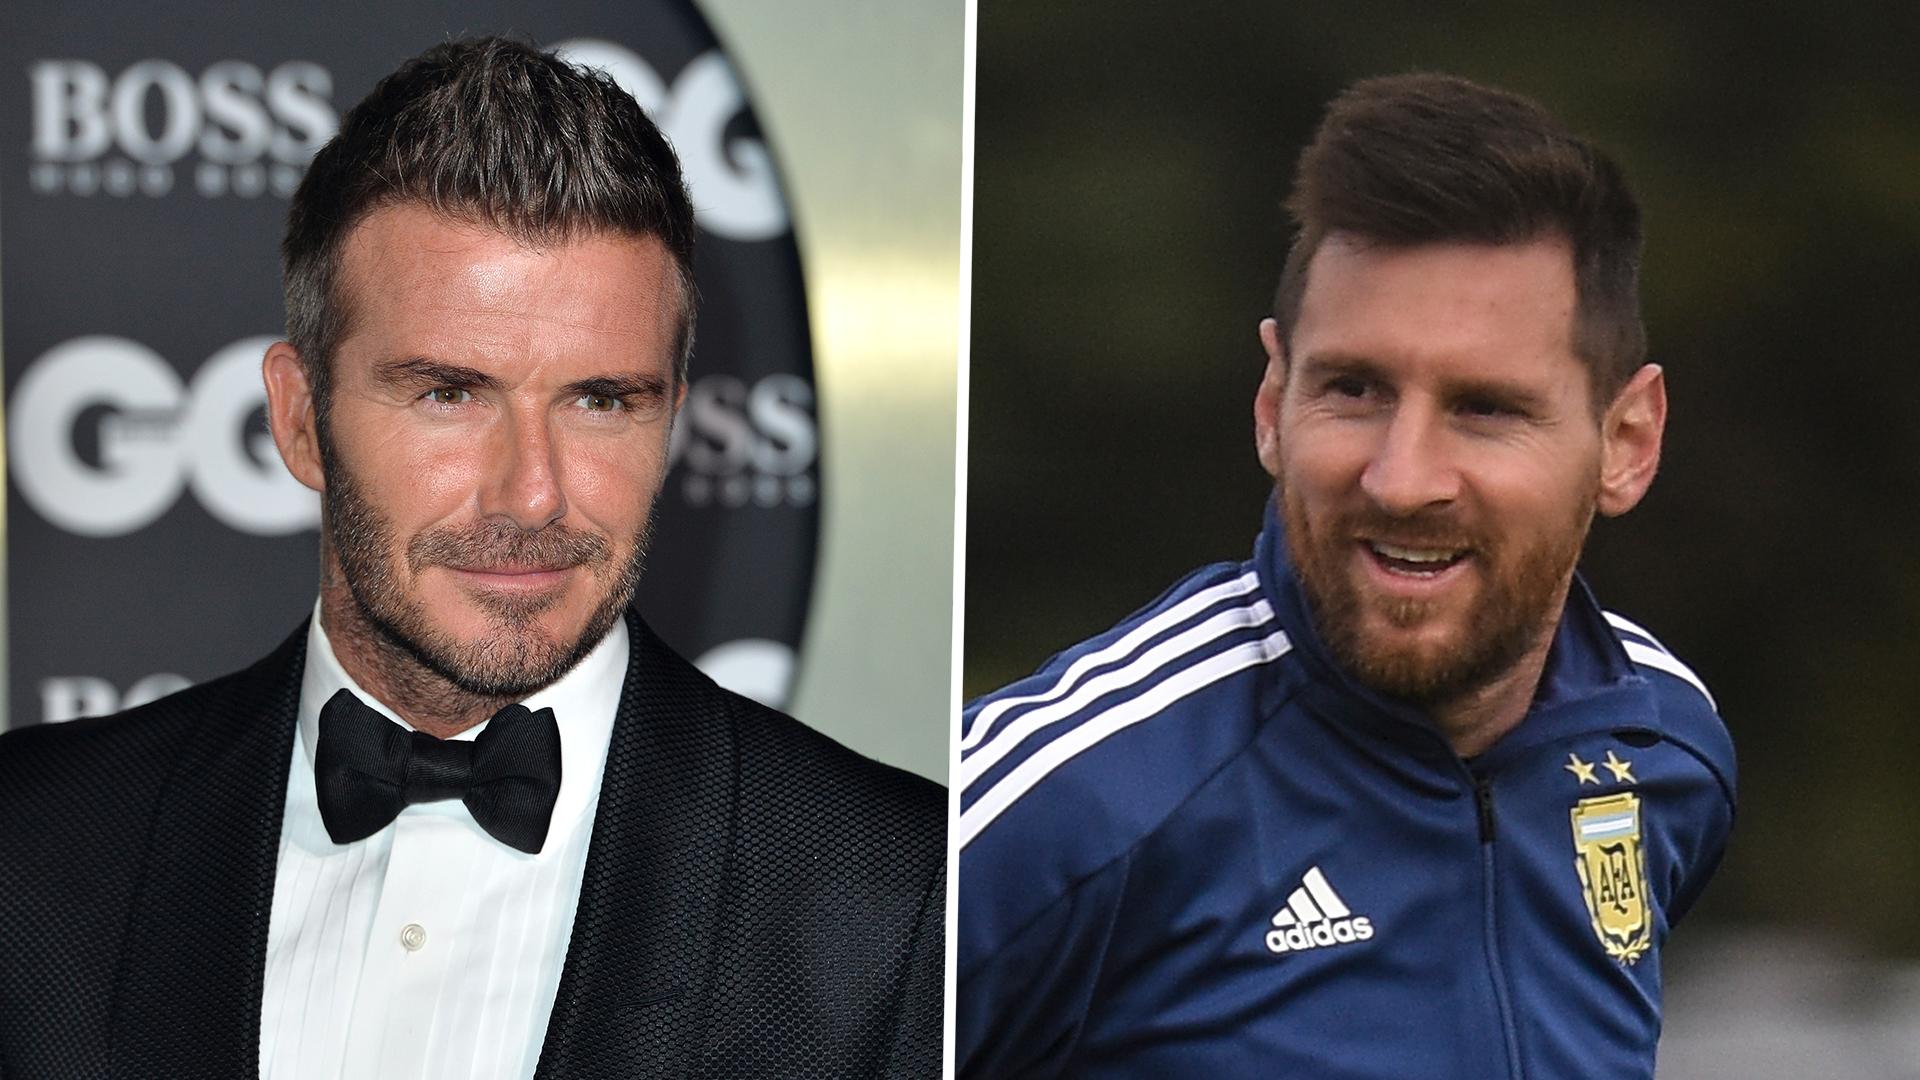 Lingard looked to model game on Messi & Beckham when making Man Utd breakthrough